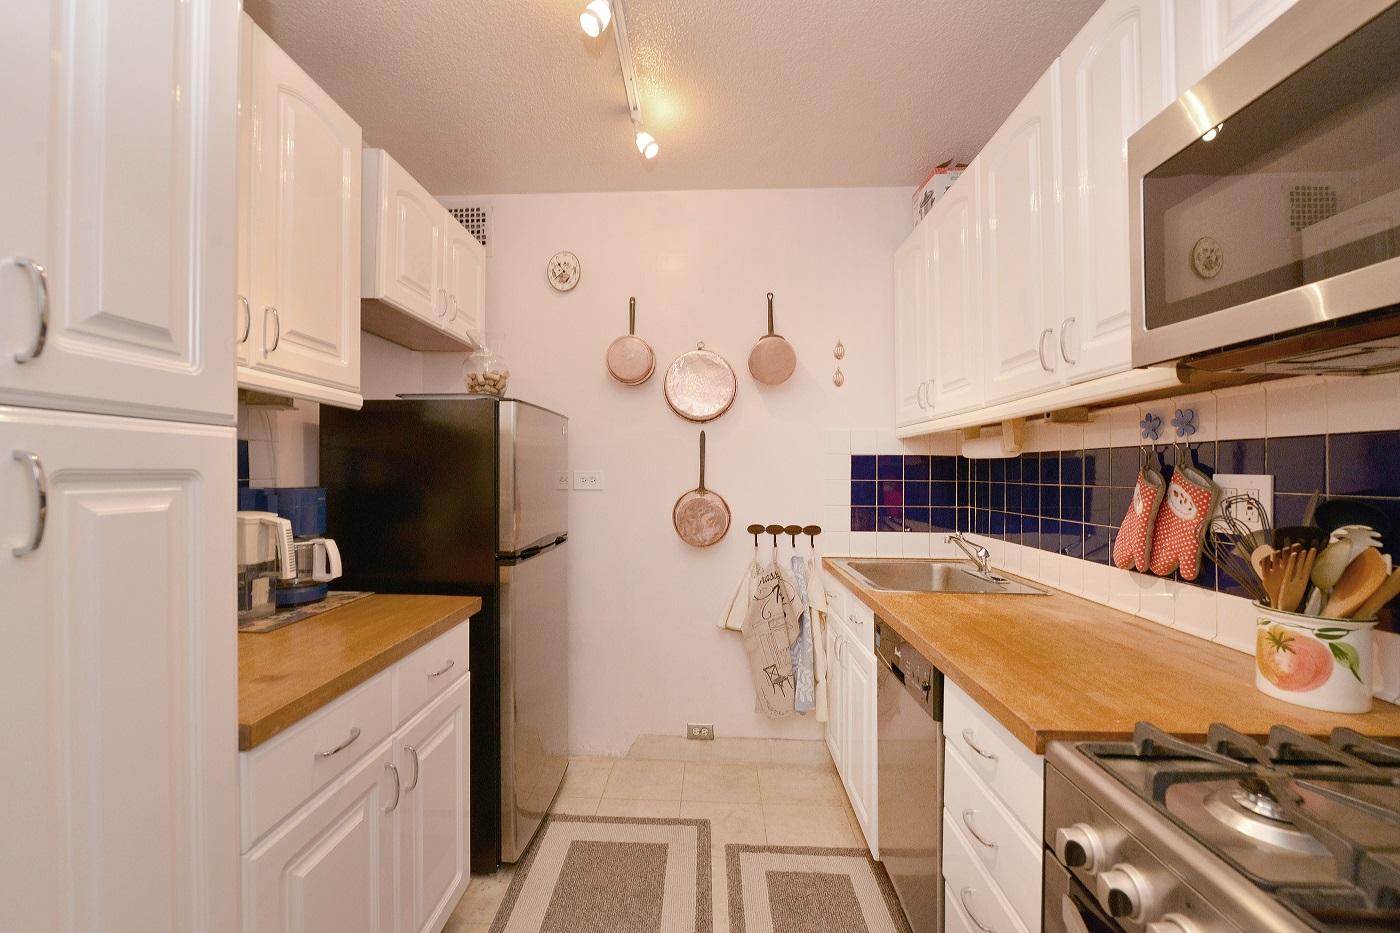 367570365east 40th street 300 3g kitchen